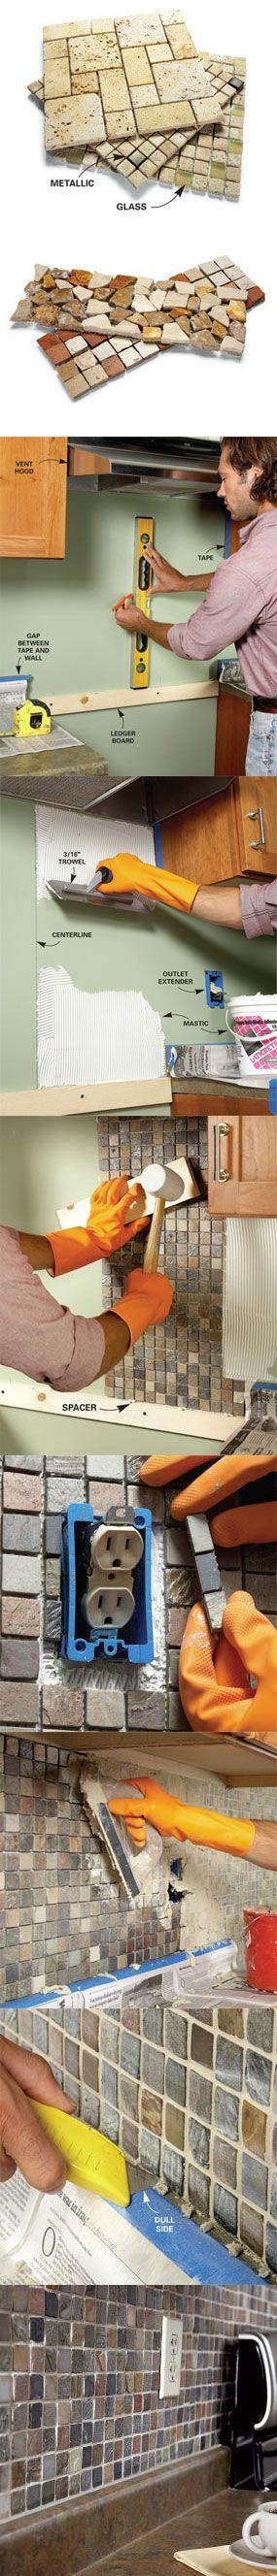 How to install a backsplash!